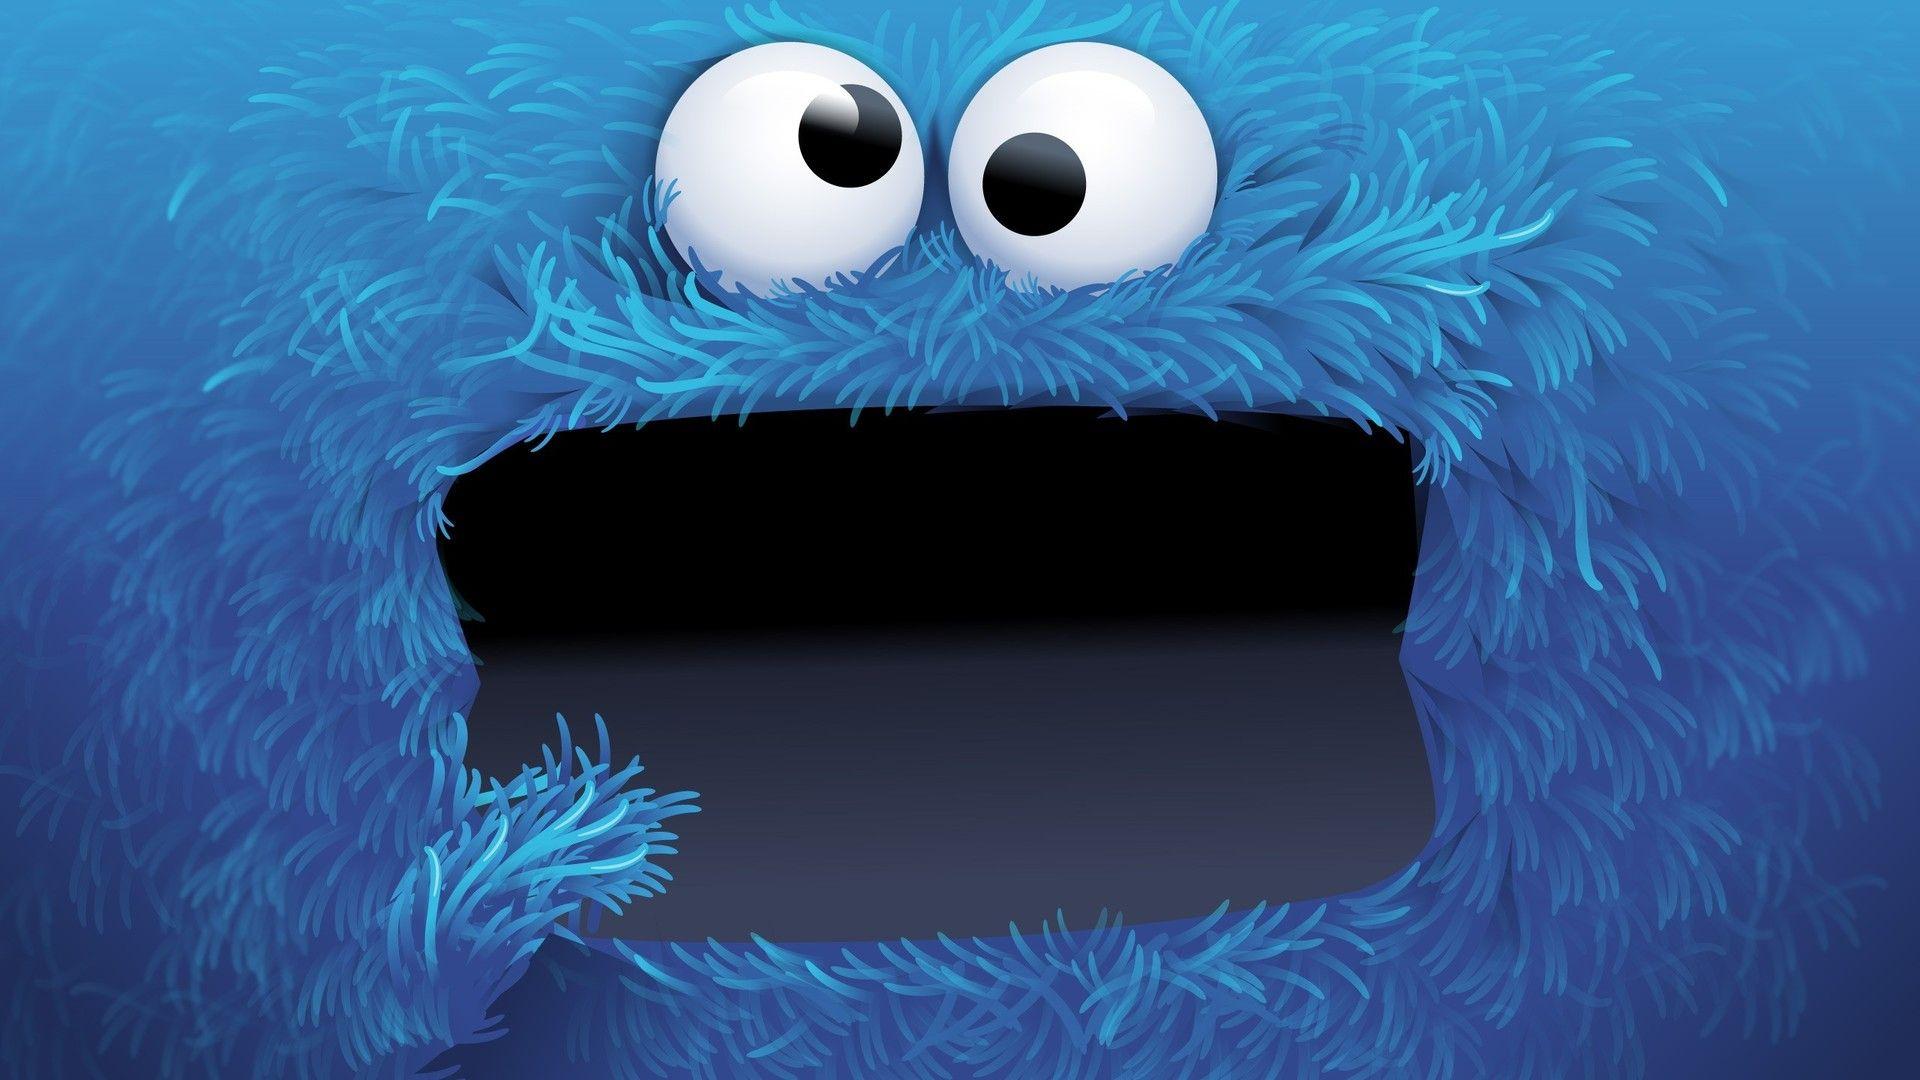 Cookie Monster Hd Wallpaper Cookie Monster Wallpaper Cartoon Wallpaper Monster Cookies